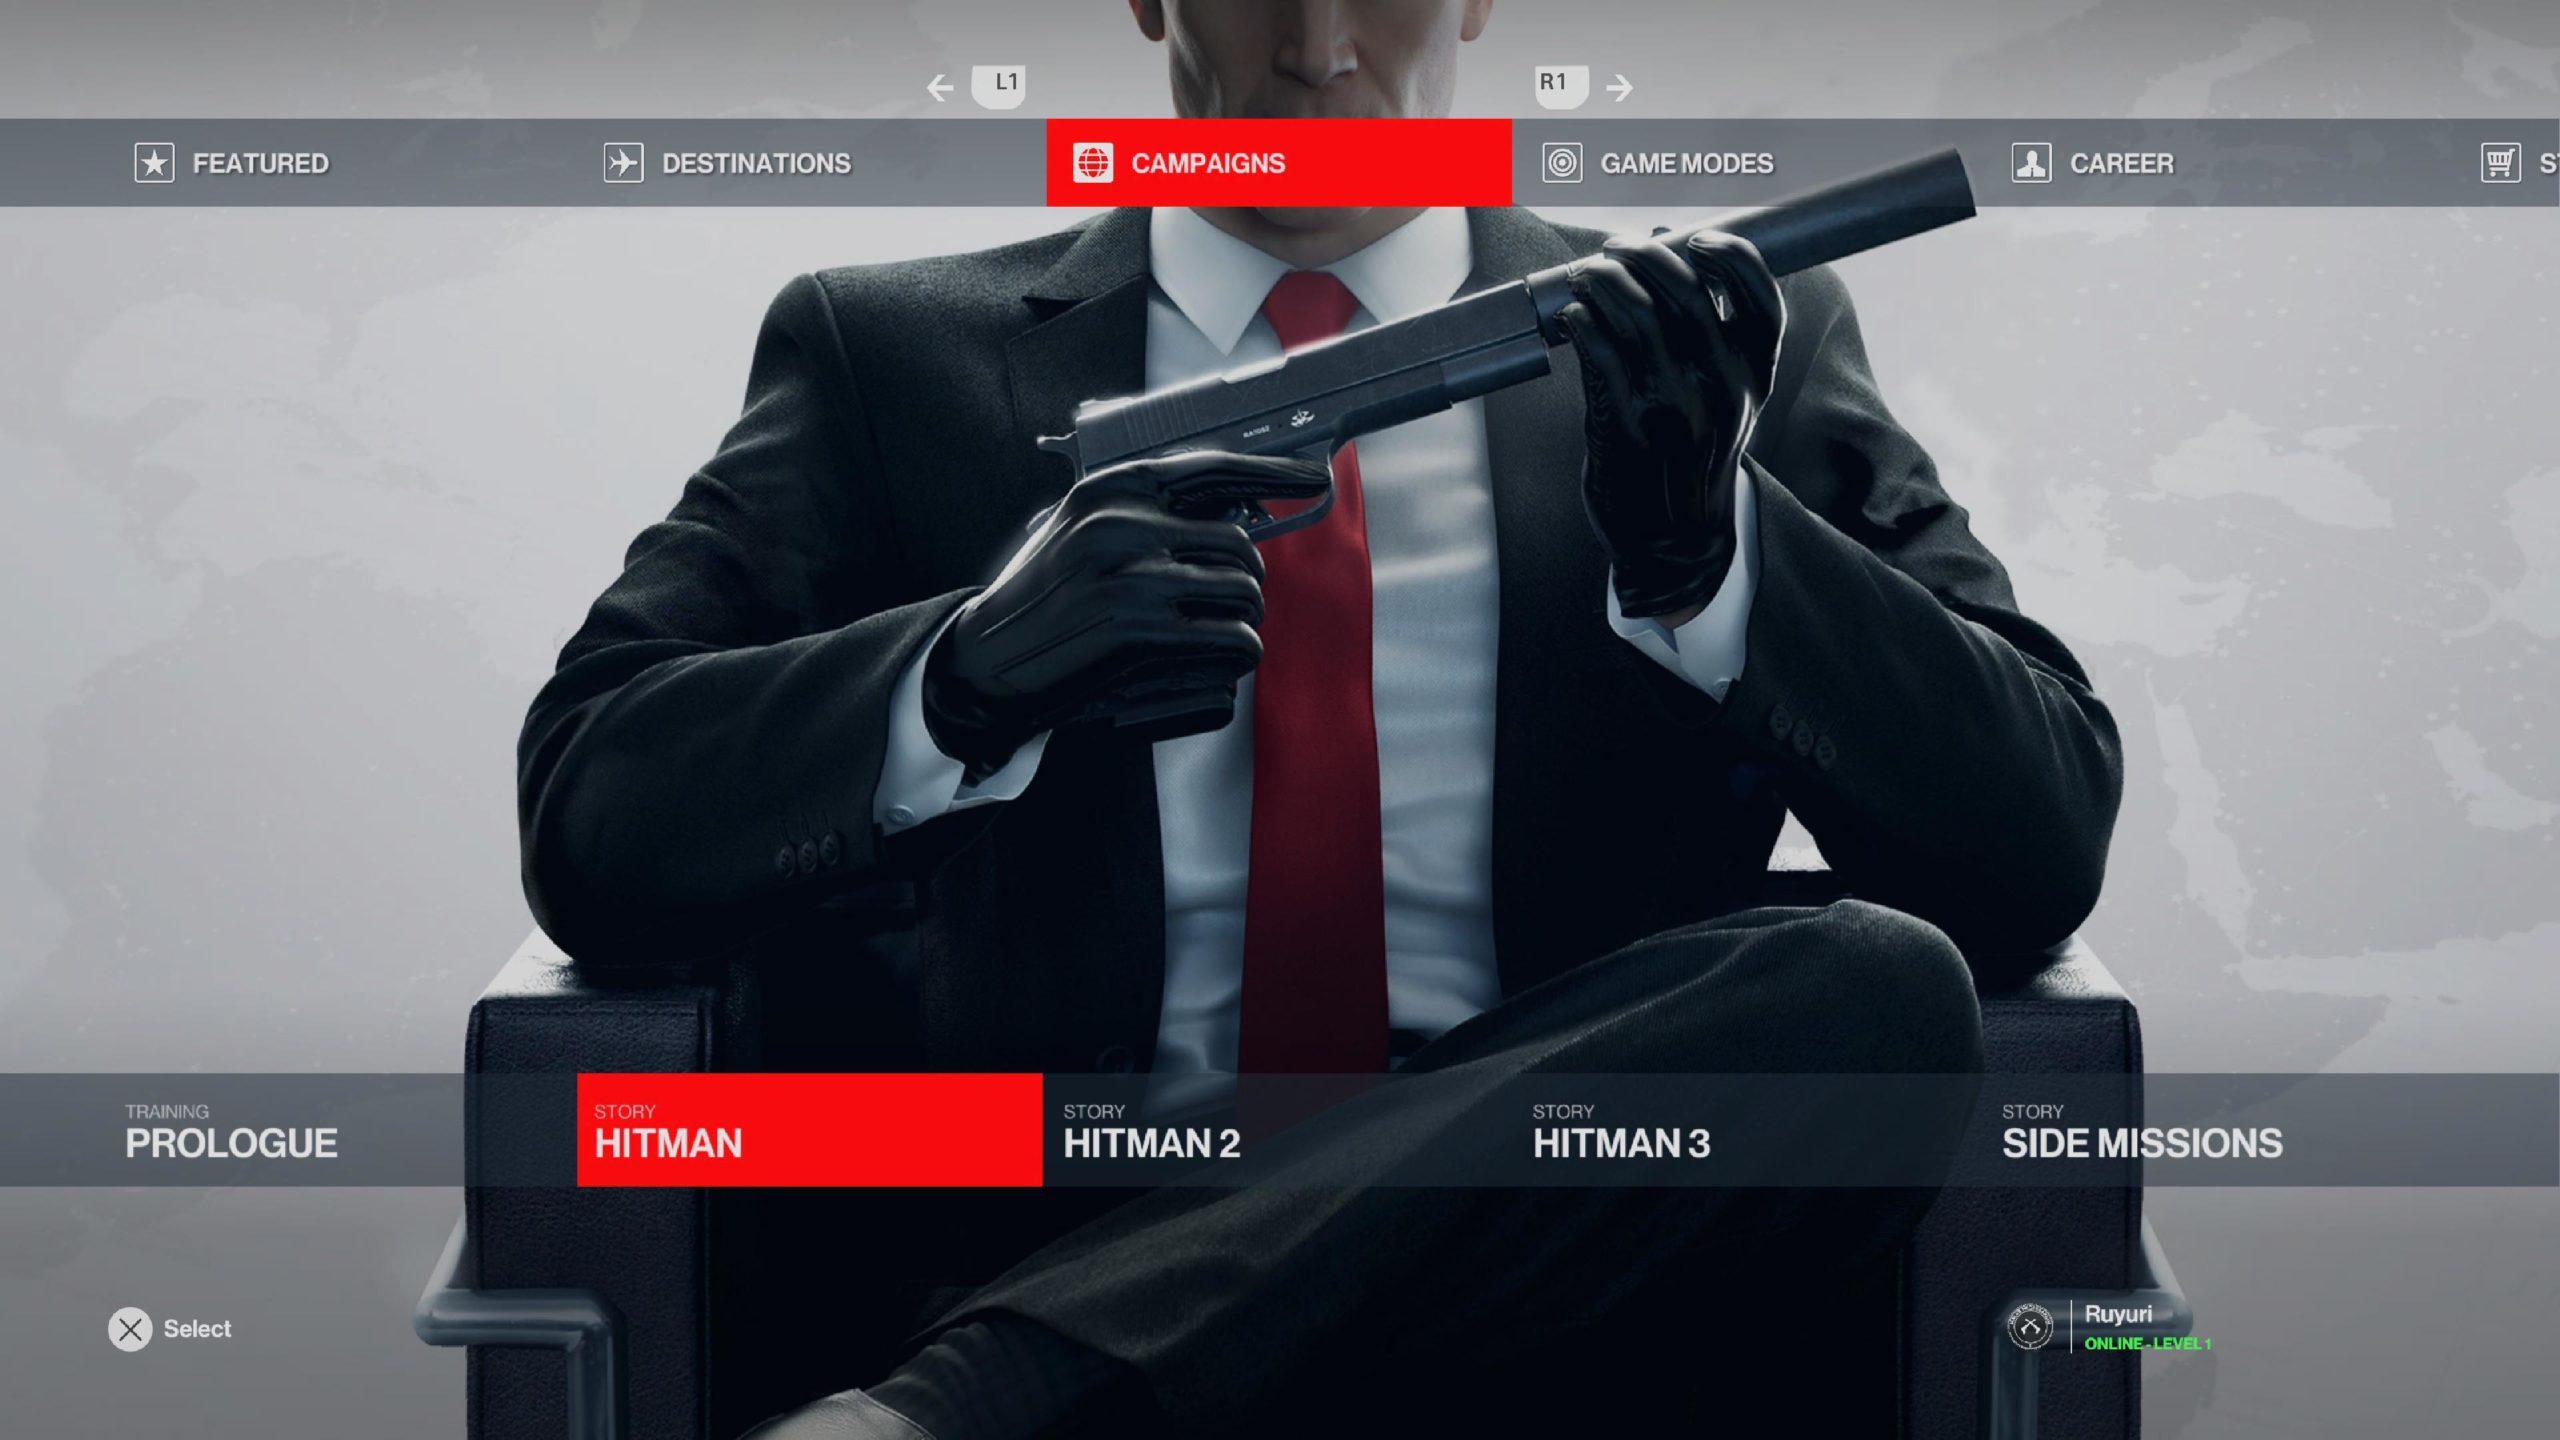 HITMAN 3: JOGADORES DO PC PODEM IMPORTAR NÍVEIS DE HITMAN E HITMAN 2 VEJA COMO